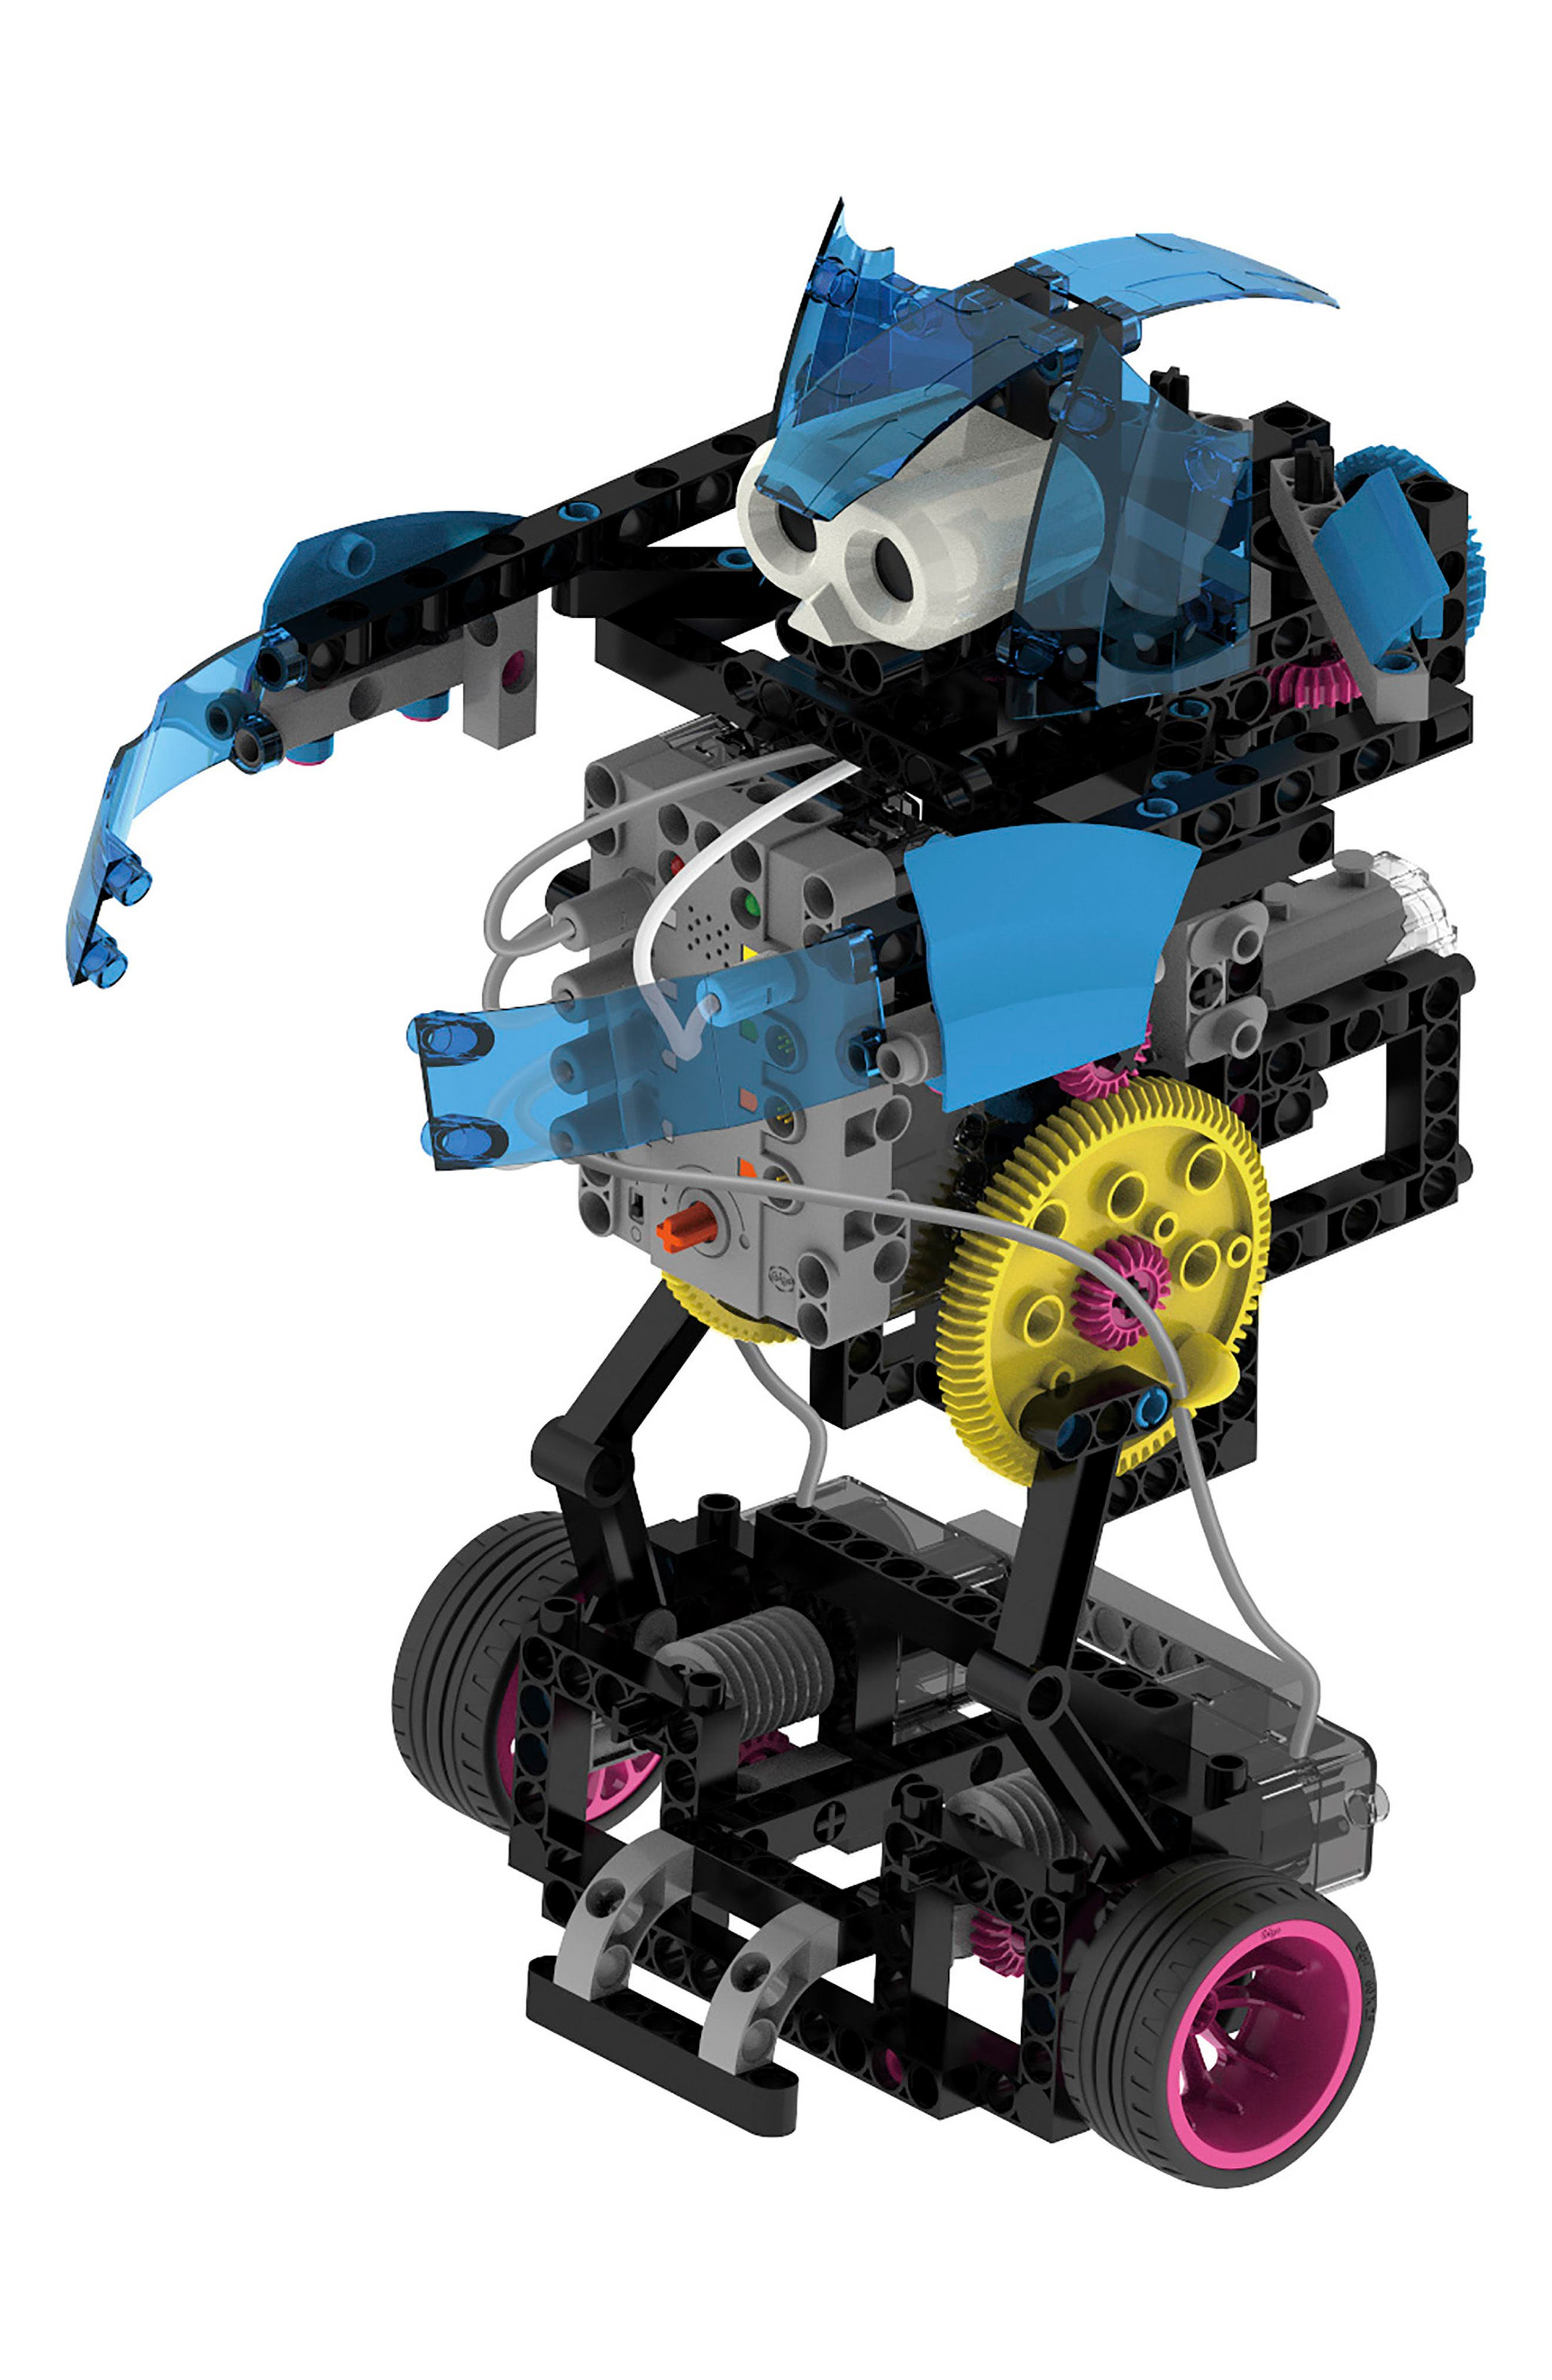 Thames & Kosmos Robotics Building Kit